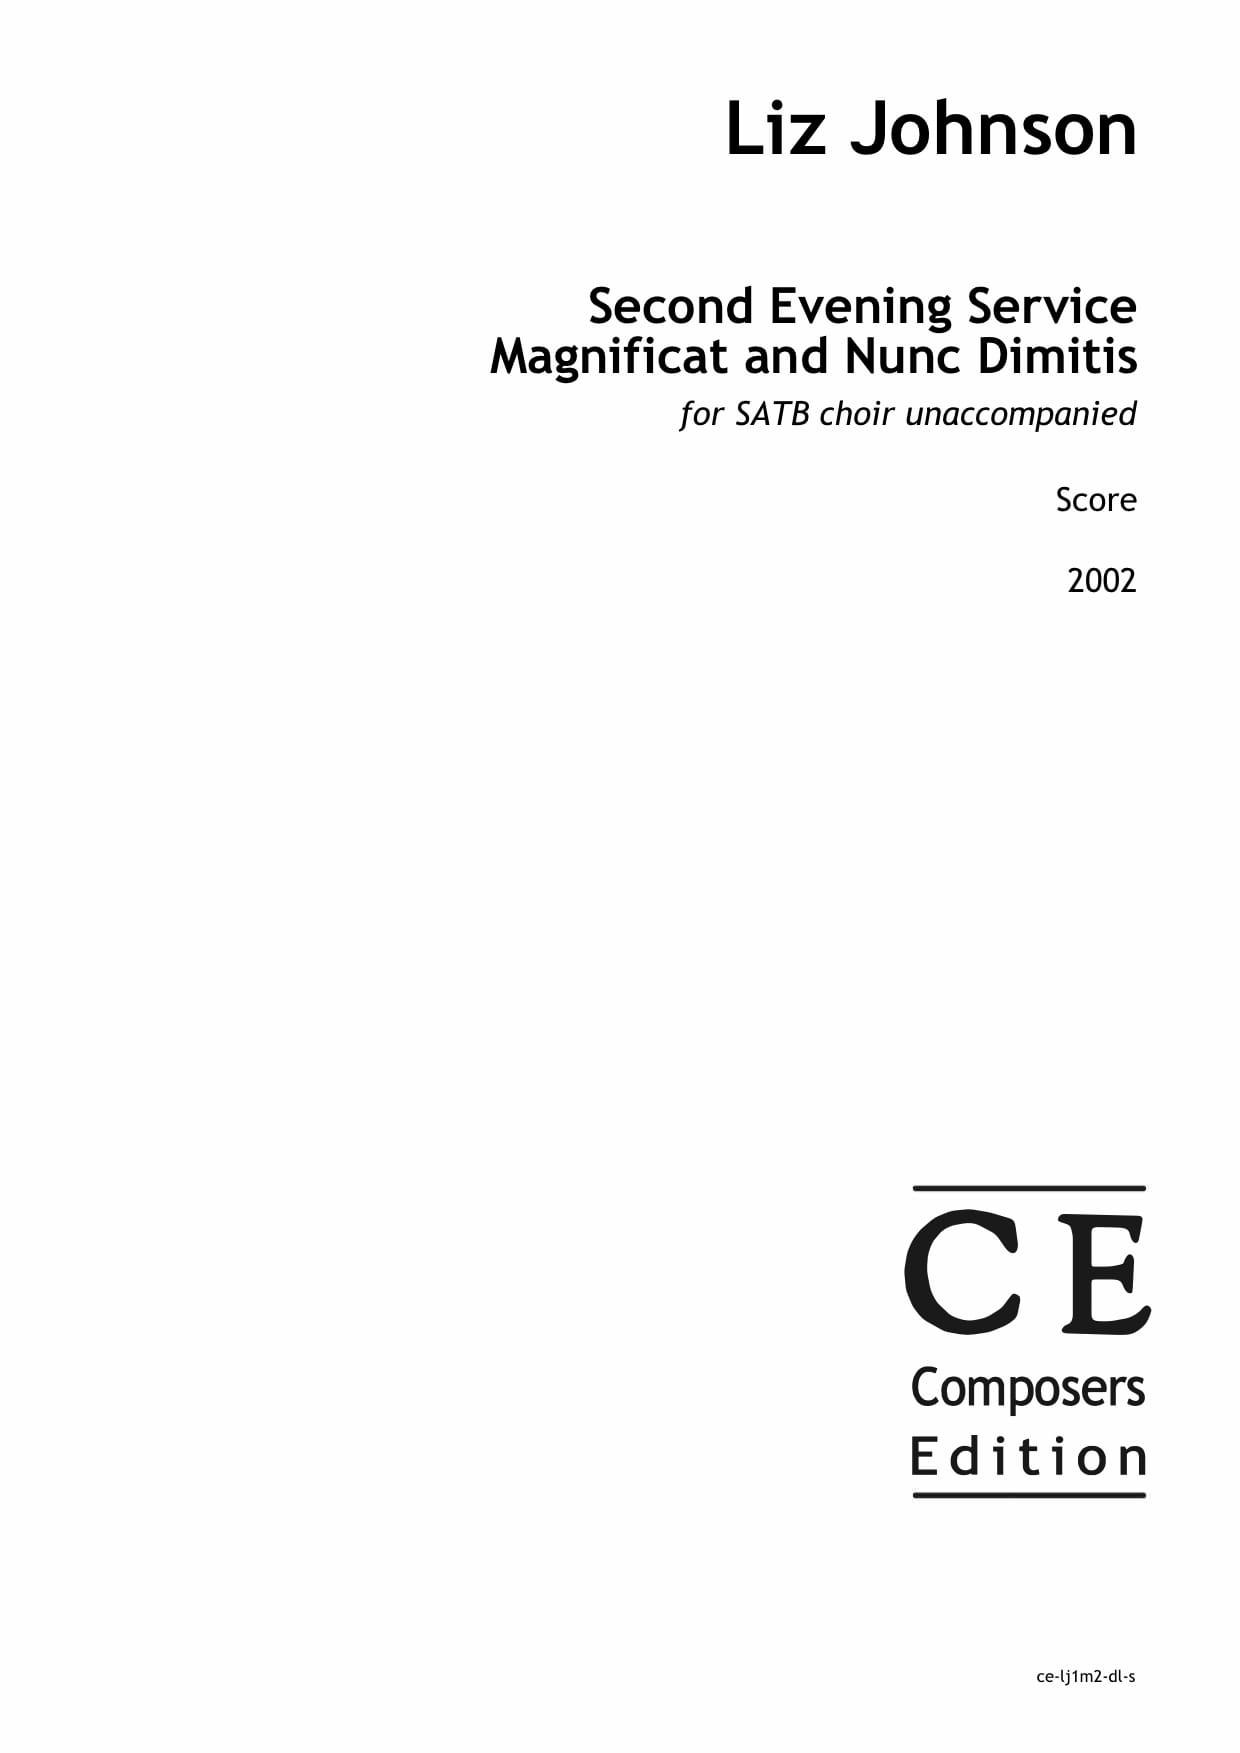 Liz Johnson: Second Evening Service Magnificat and Nunc Dimitis for SATB choir unaccompanied